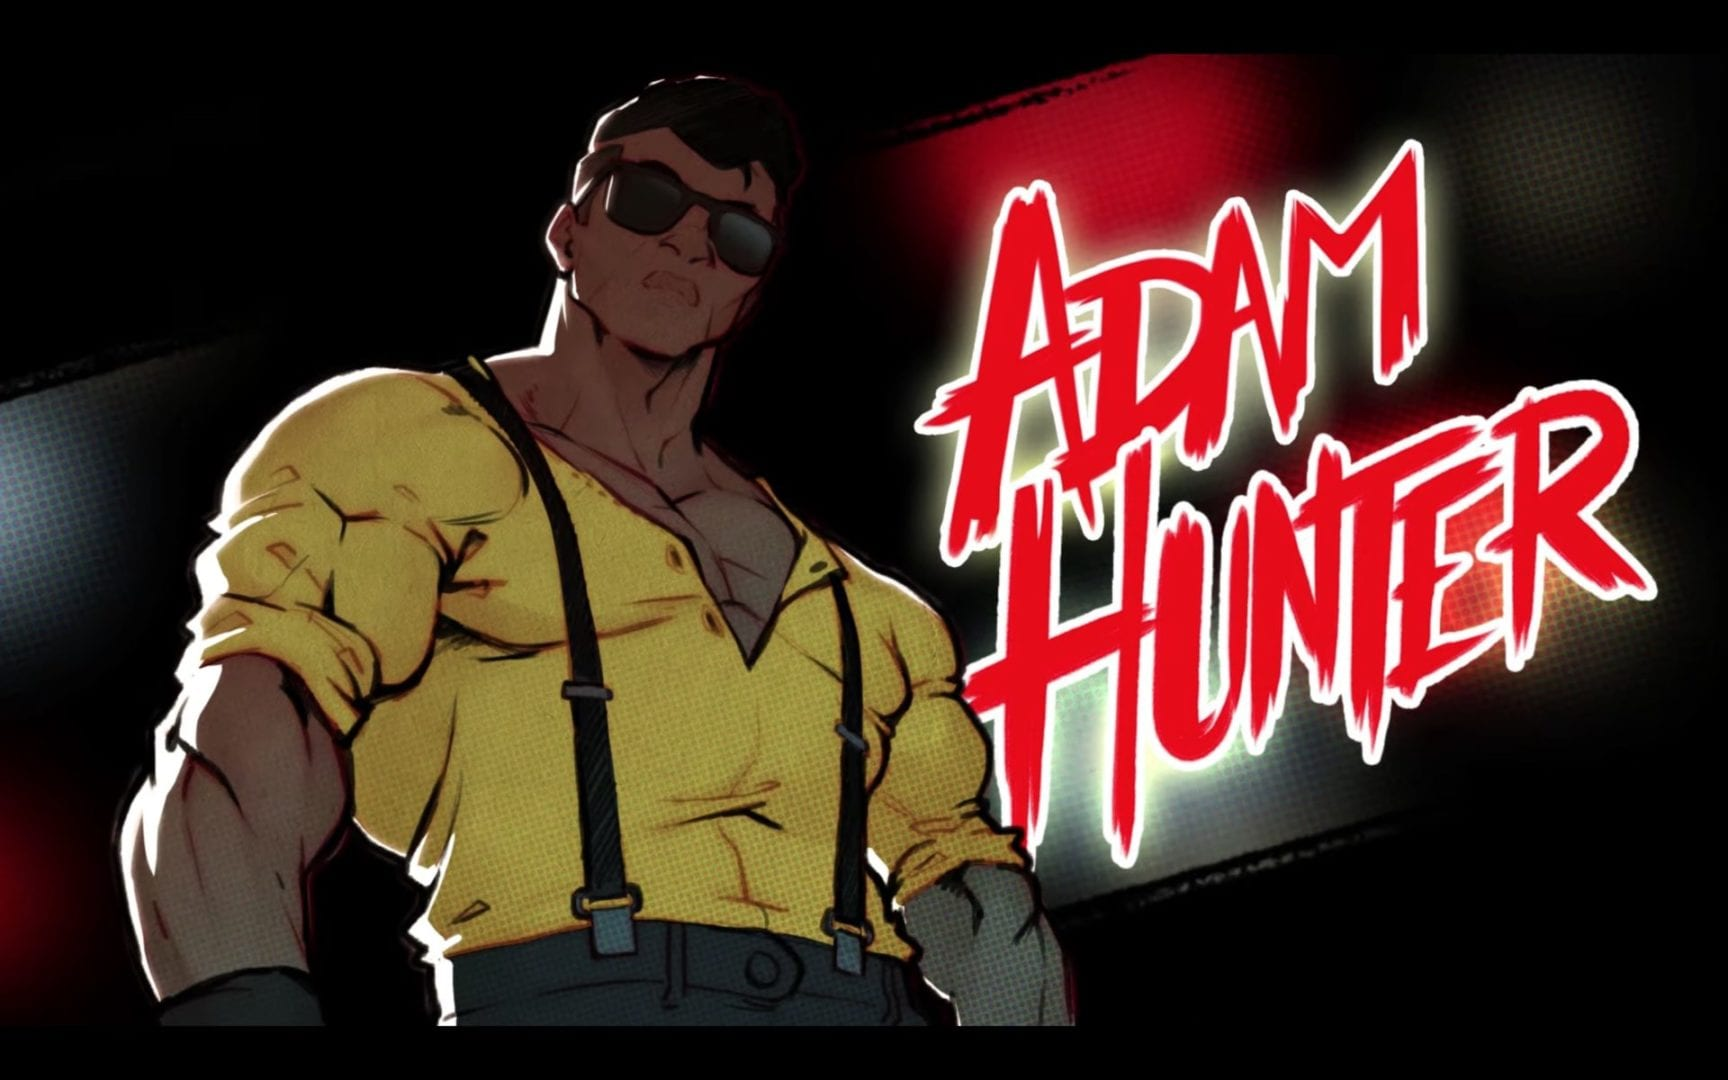 Streets of Rage 4 Adam Hunter